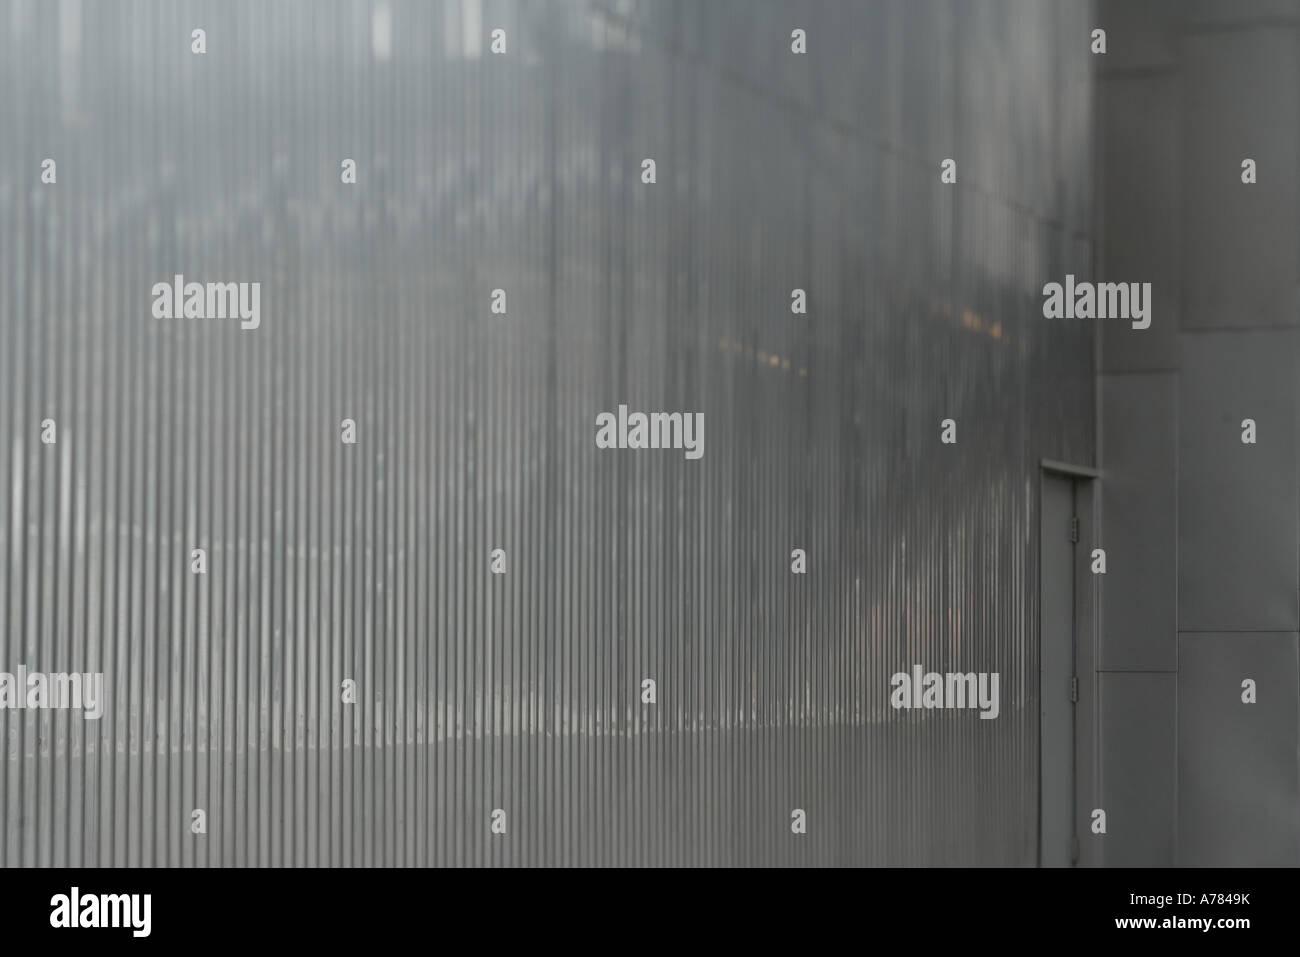 Textured metal background immagini & textured metal background fotos